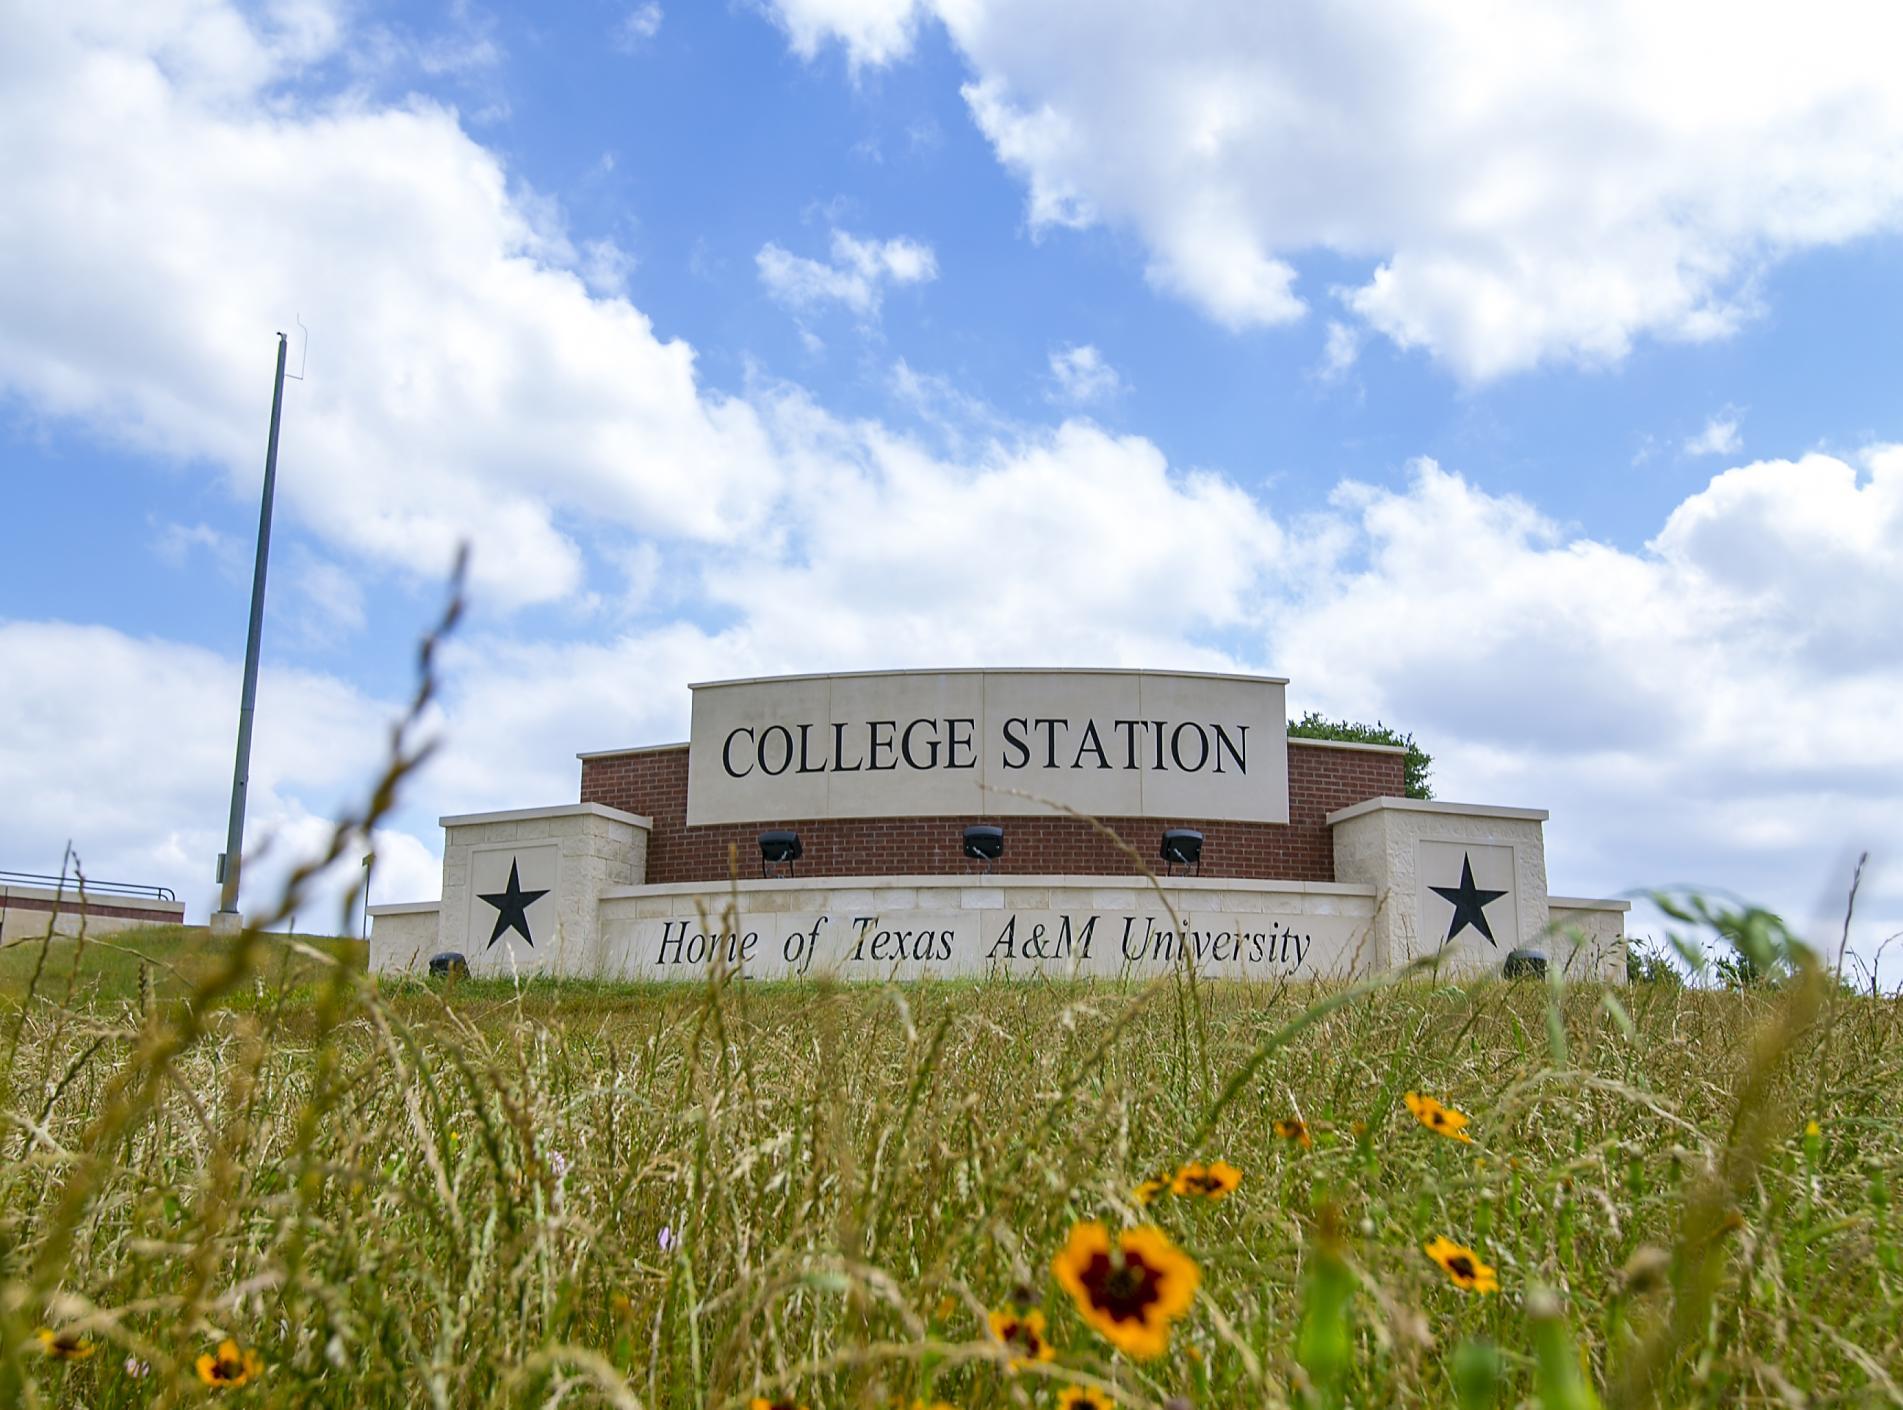 College Station